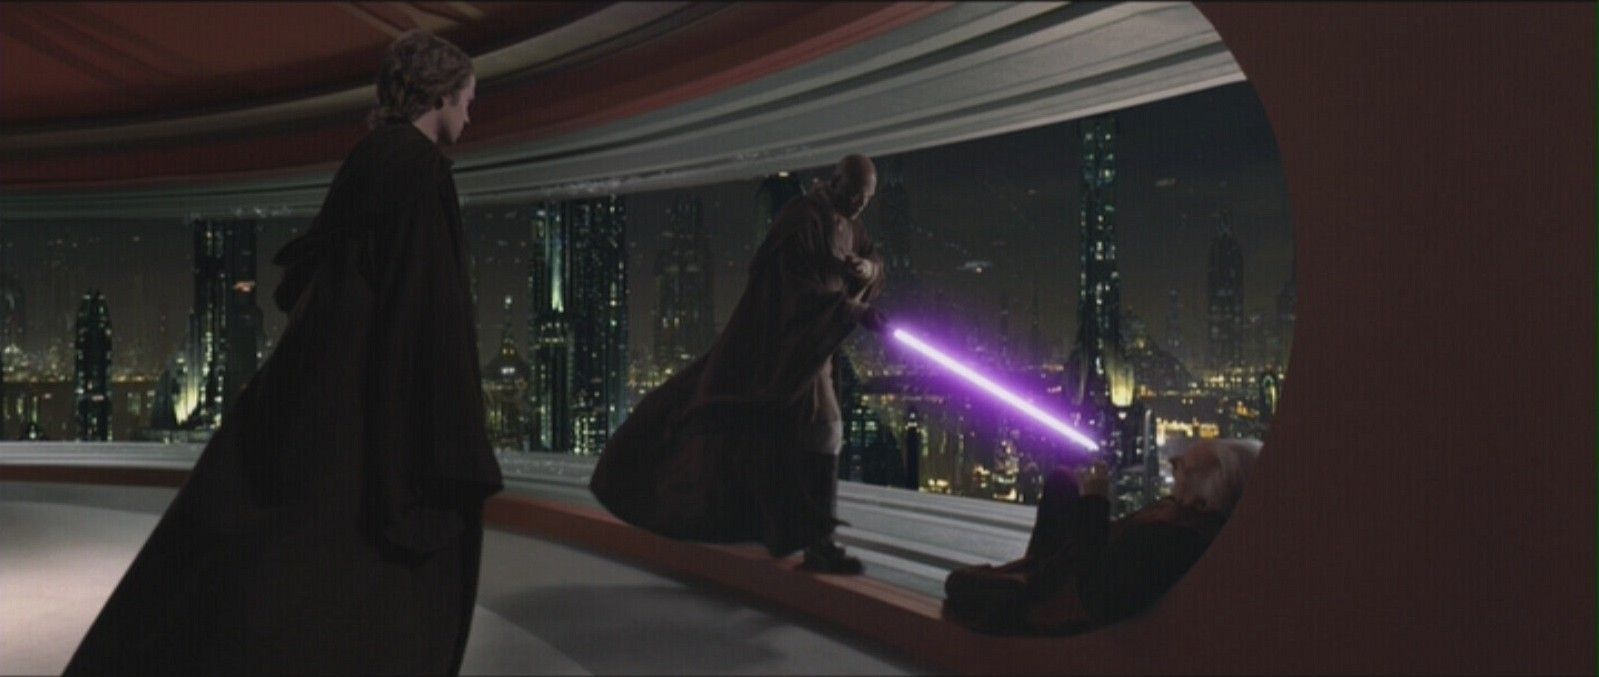 Star Wars Revenge Of The Sith Mace Windu Image 12231167 Fanpop